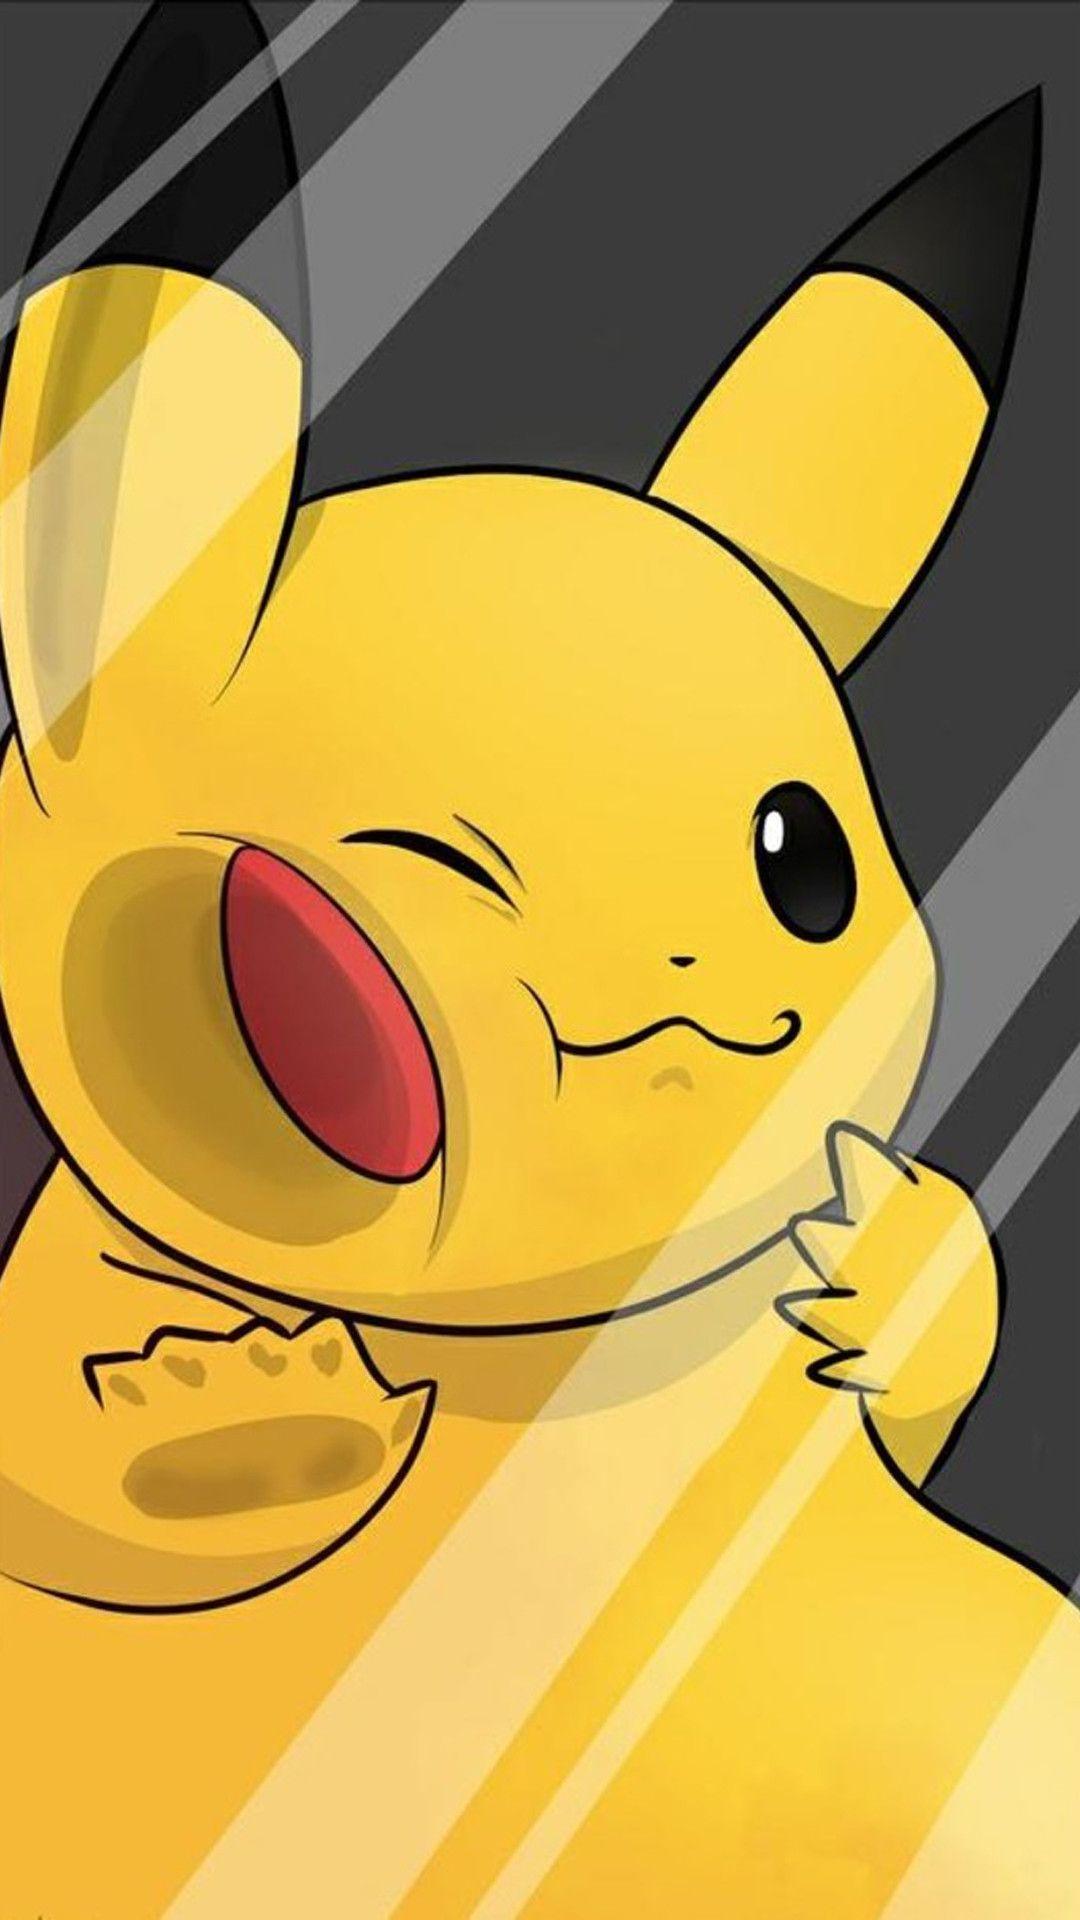 Pikachu Pikachu Pikachu Pikachu In 2020 Pikachu Wallpaper Anime Wallpaper Pikachu Drawing